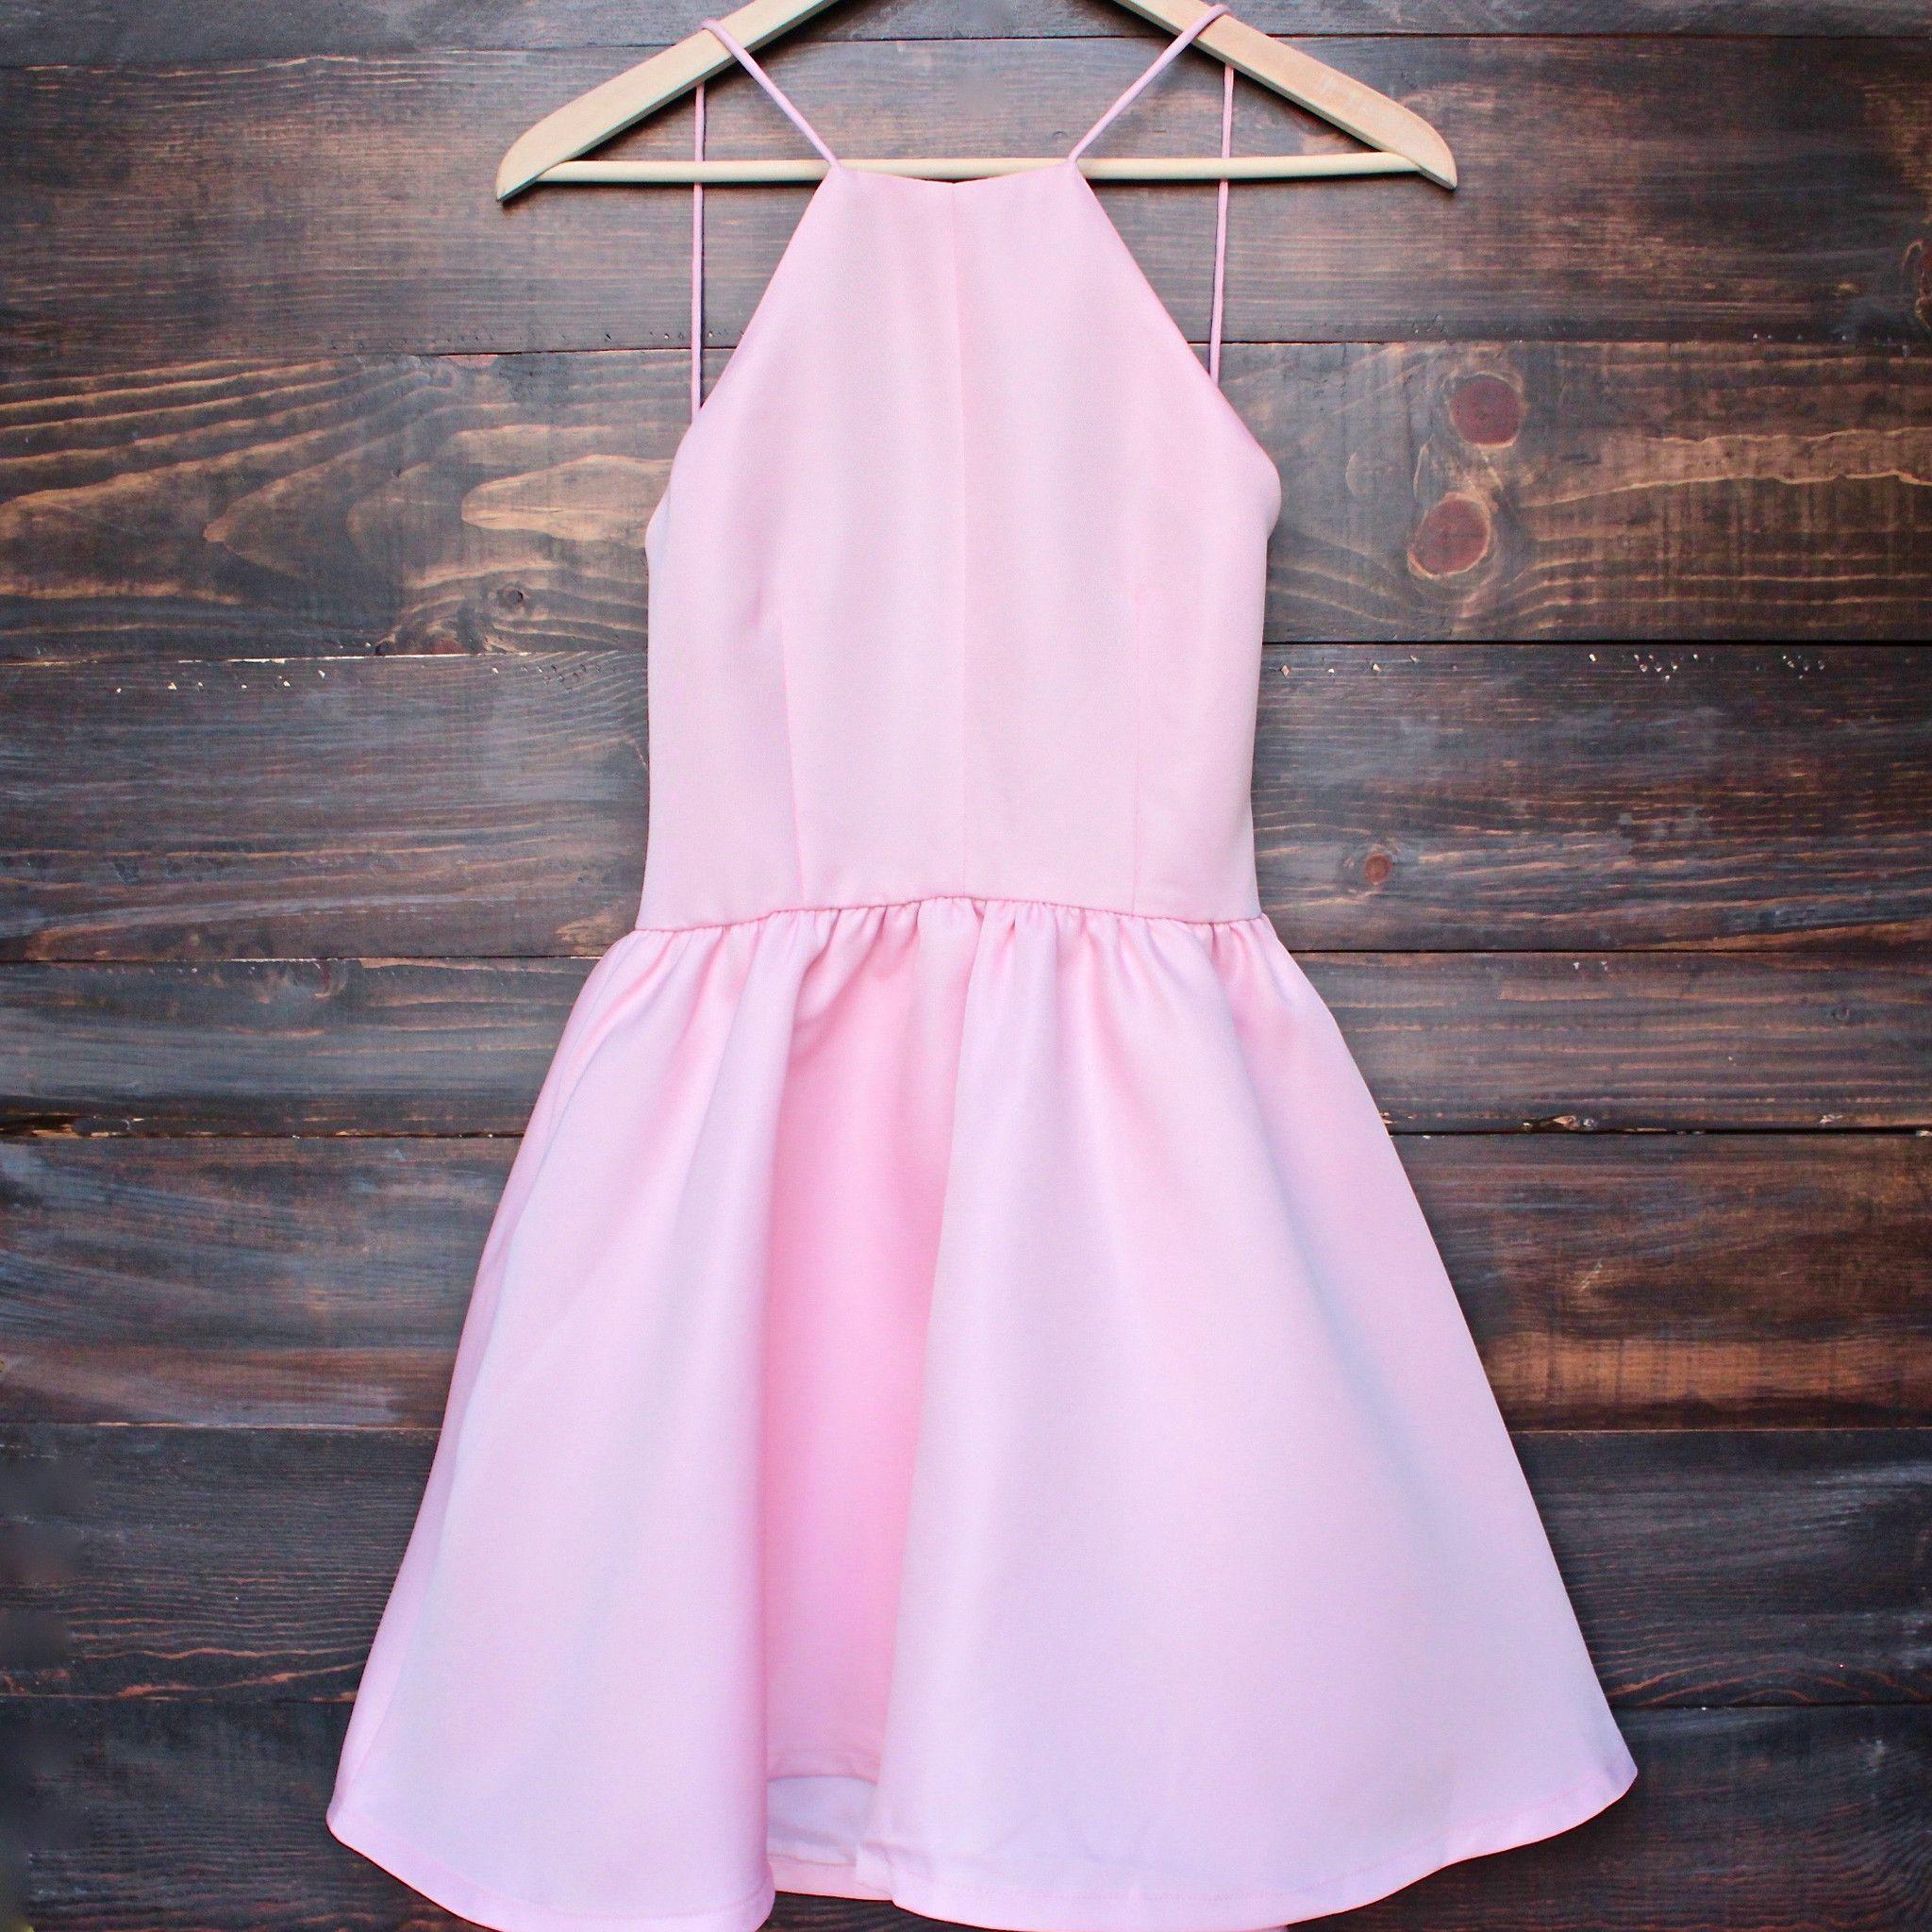 Floral fit & flare dress (more colors/prints)   Vestiditos, Ropa y ...